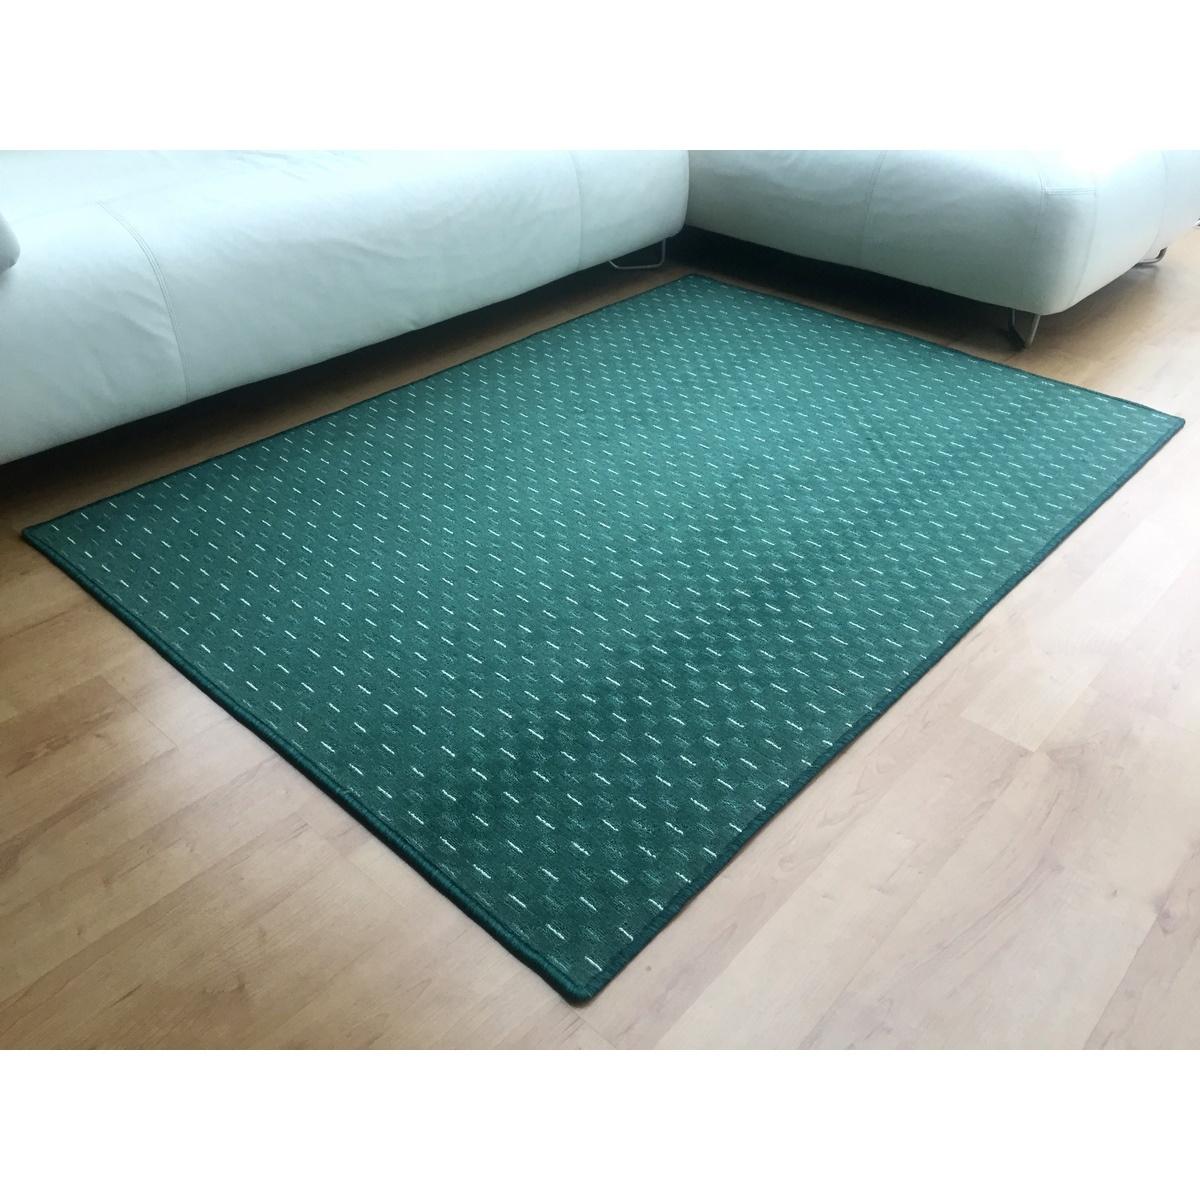 Vopi Kusový koberec Valencia zelená, 80 x 150 cm